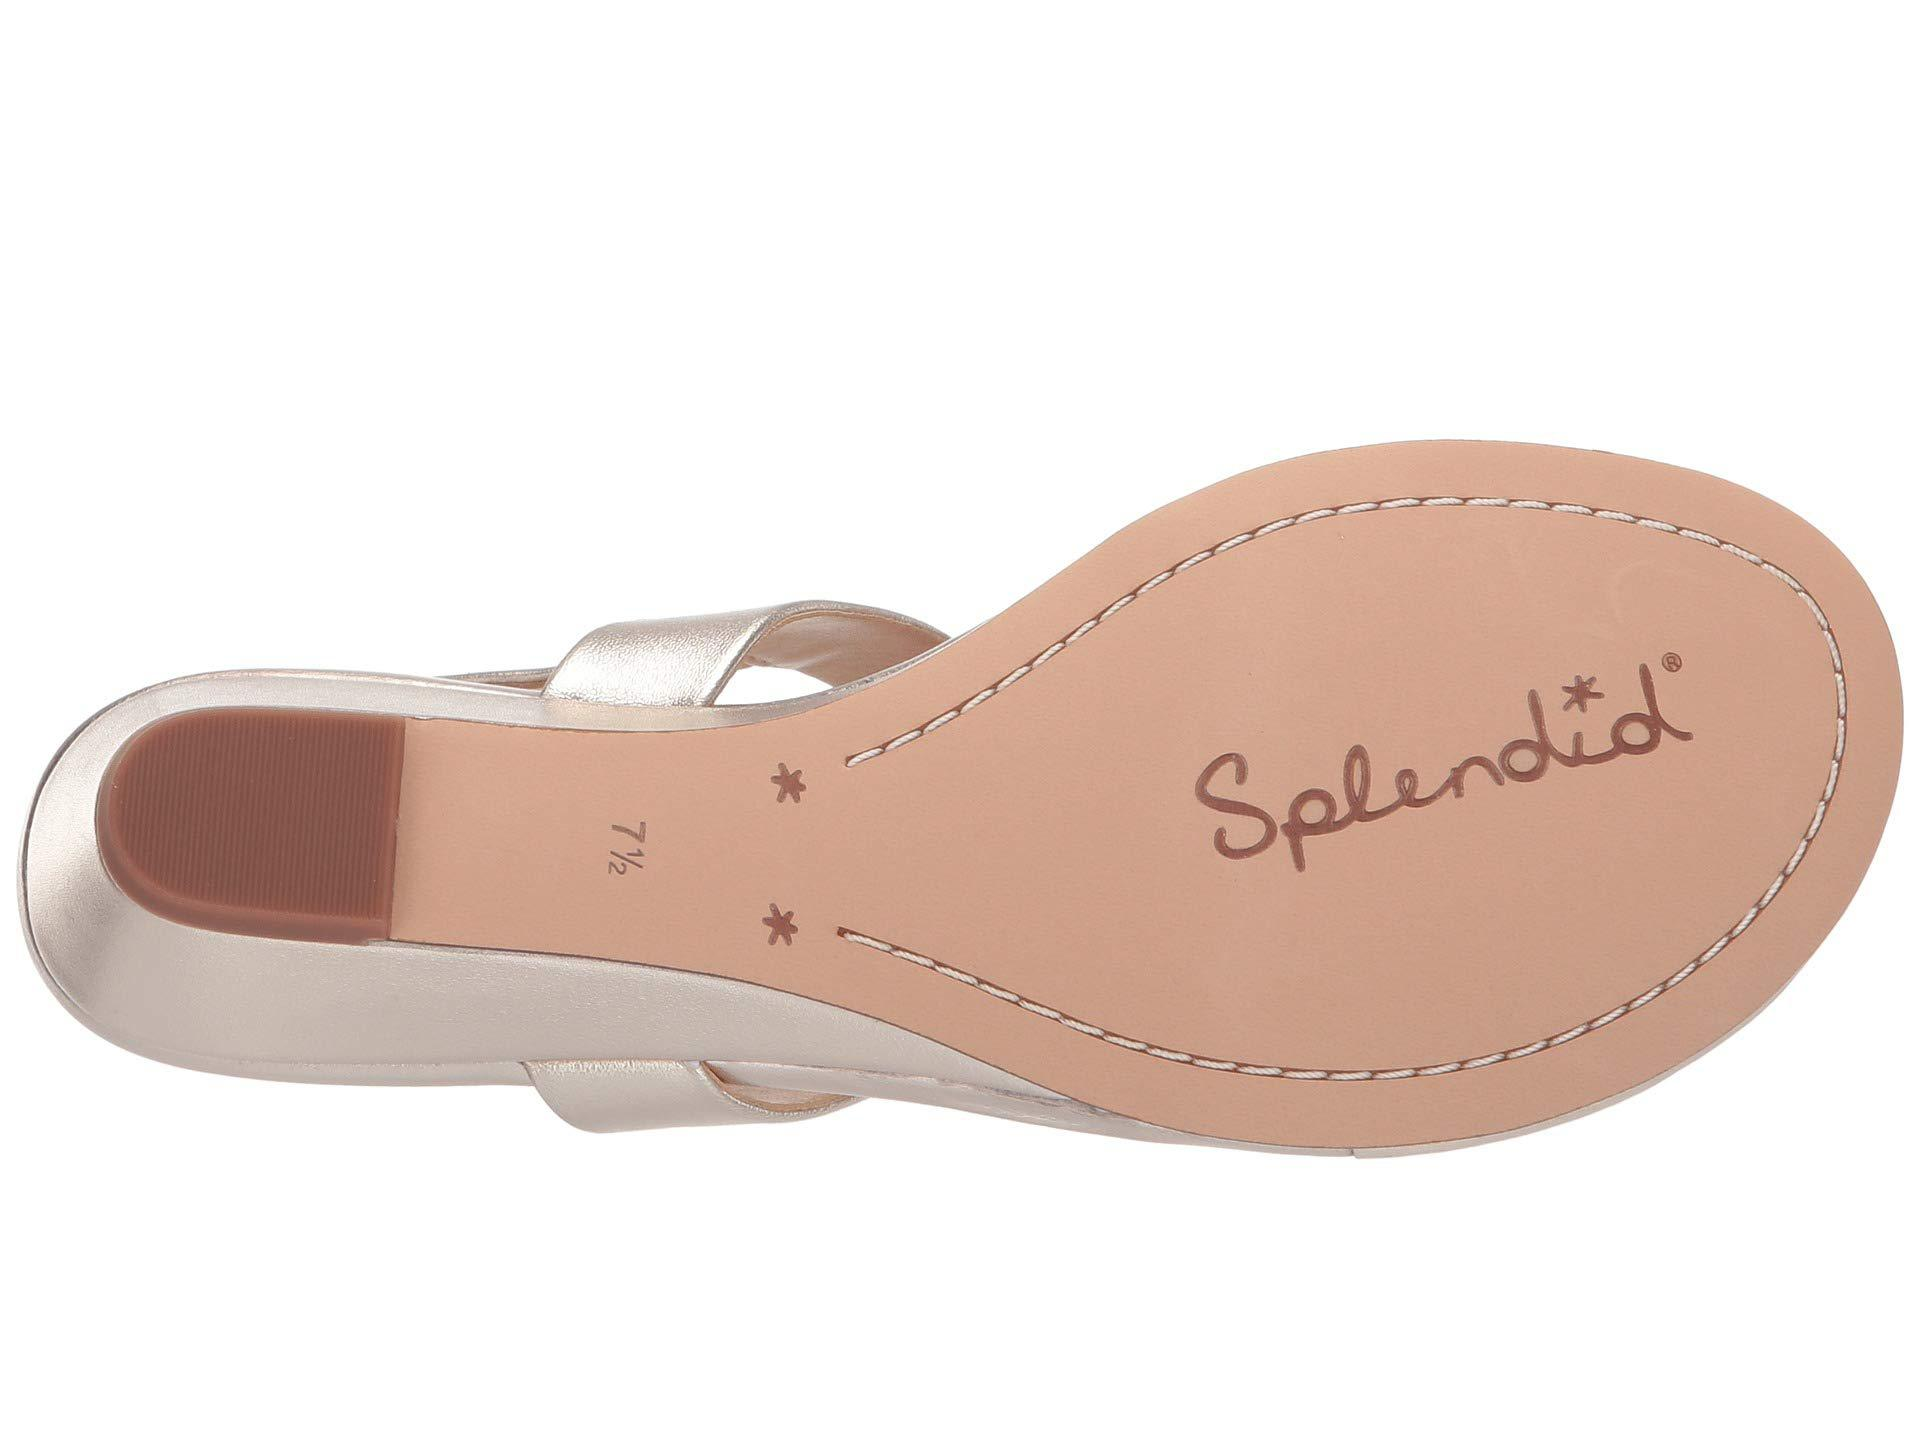 90a1c4e90ac Lyst - Splendid Swain (gold Metallic) Women s Wedge Shoes in Metallic